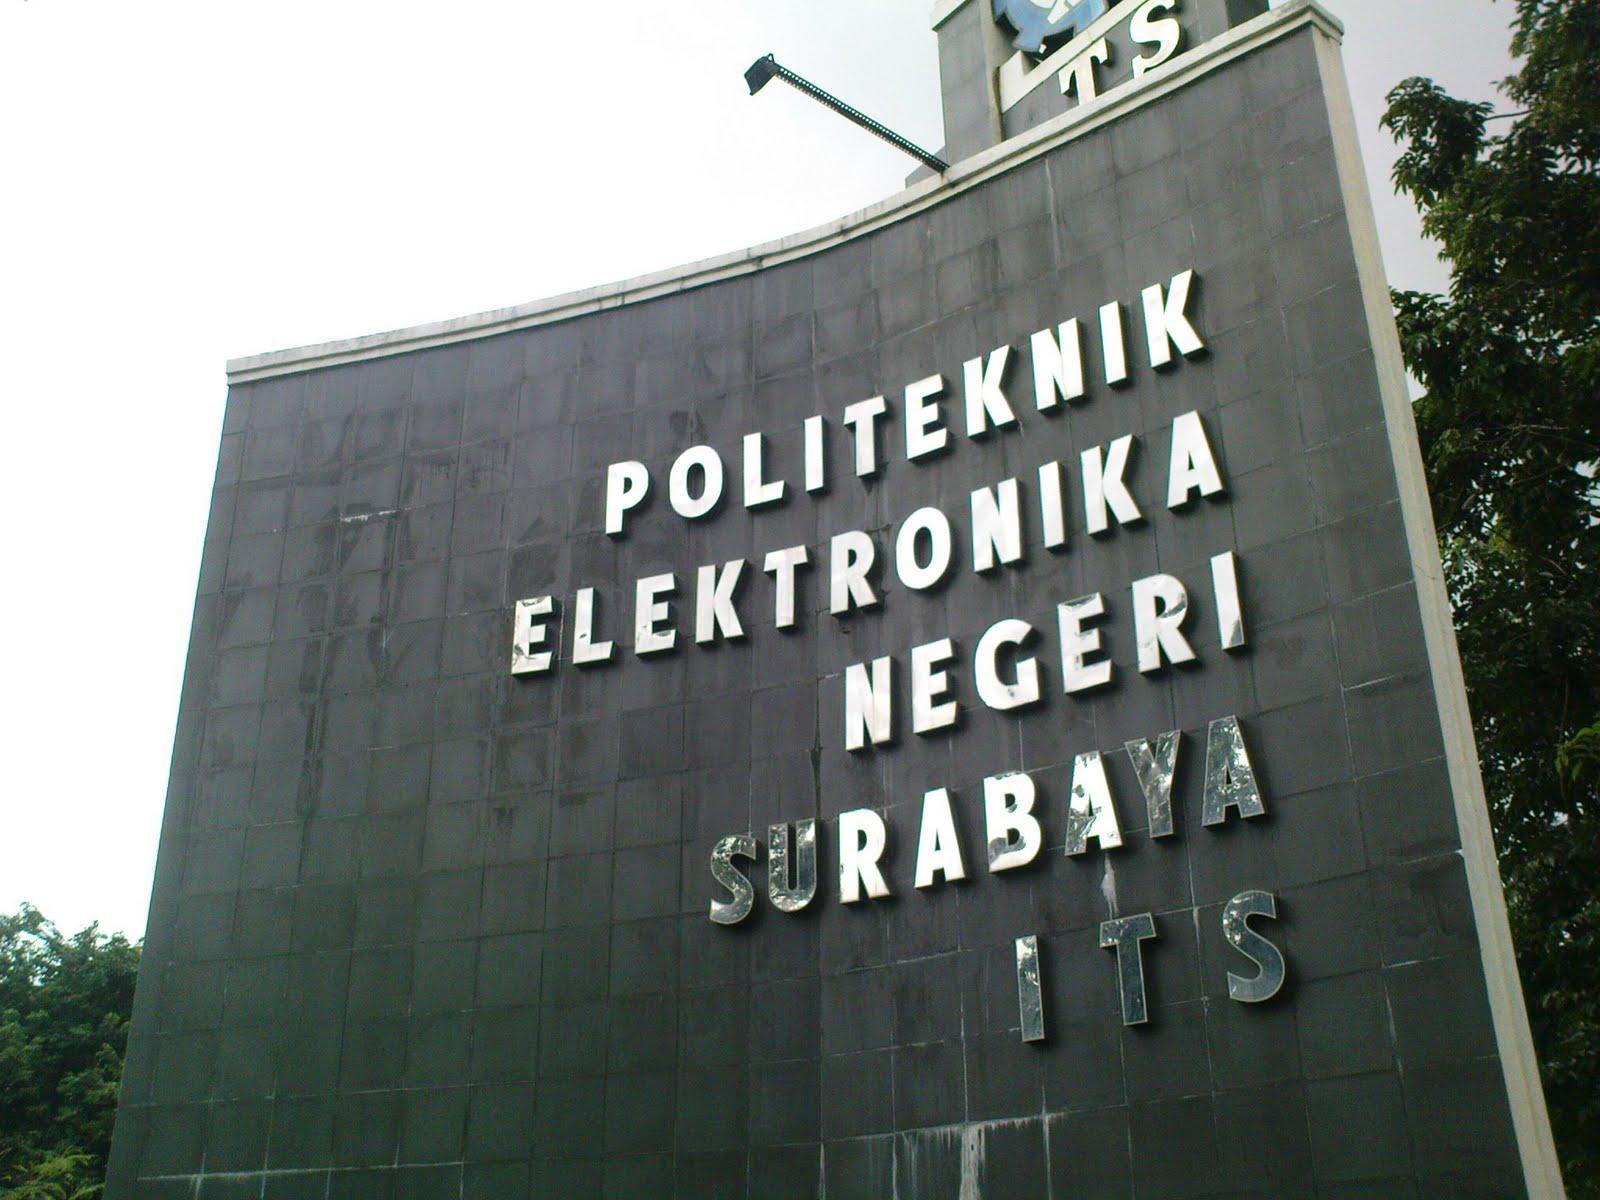 Biaya Kuliah Politeknik Elektronika Negeri Surabaya (PENS)